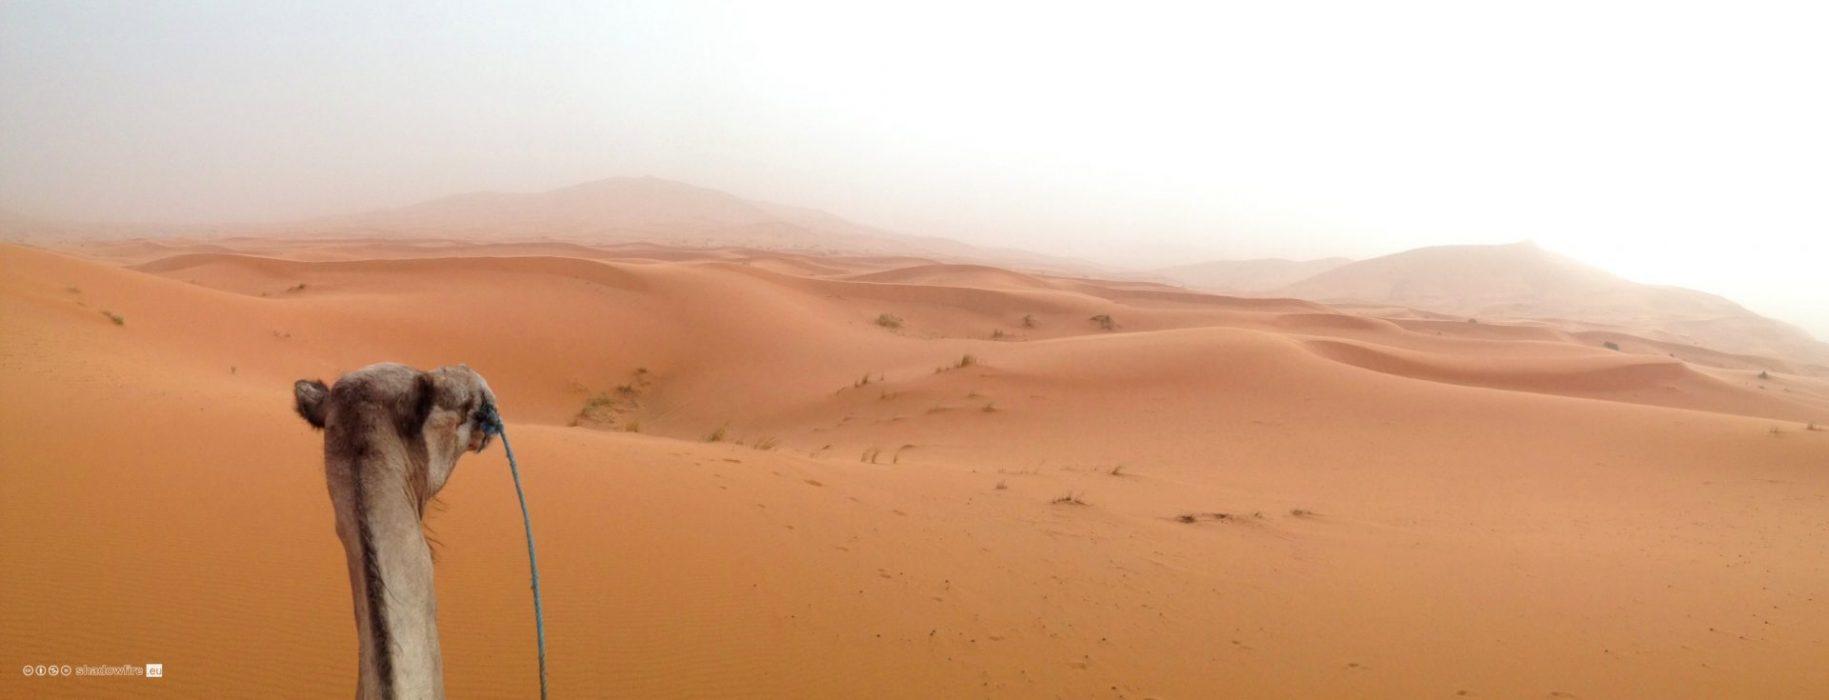 Morocco, Sahara, desert, camel